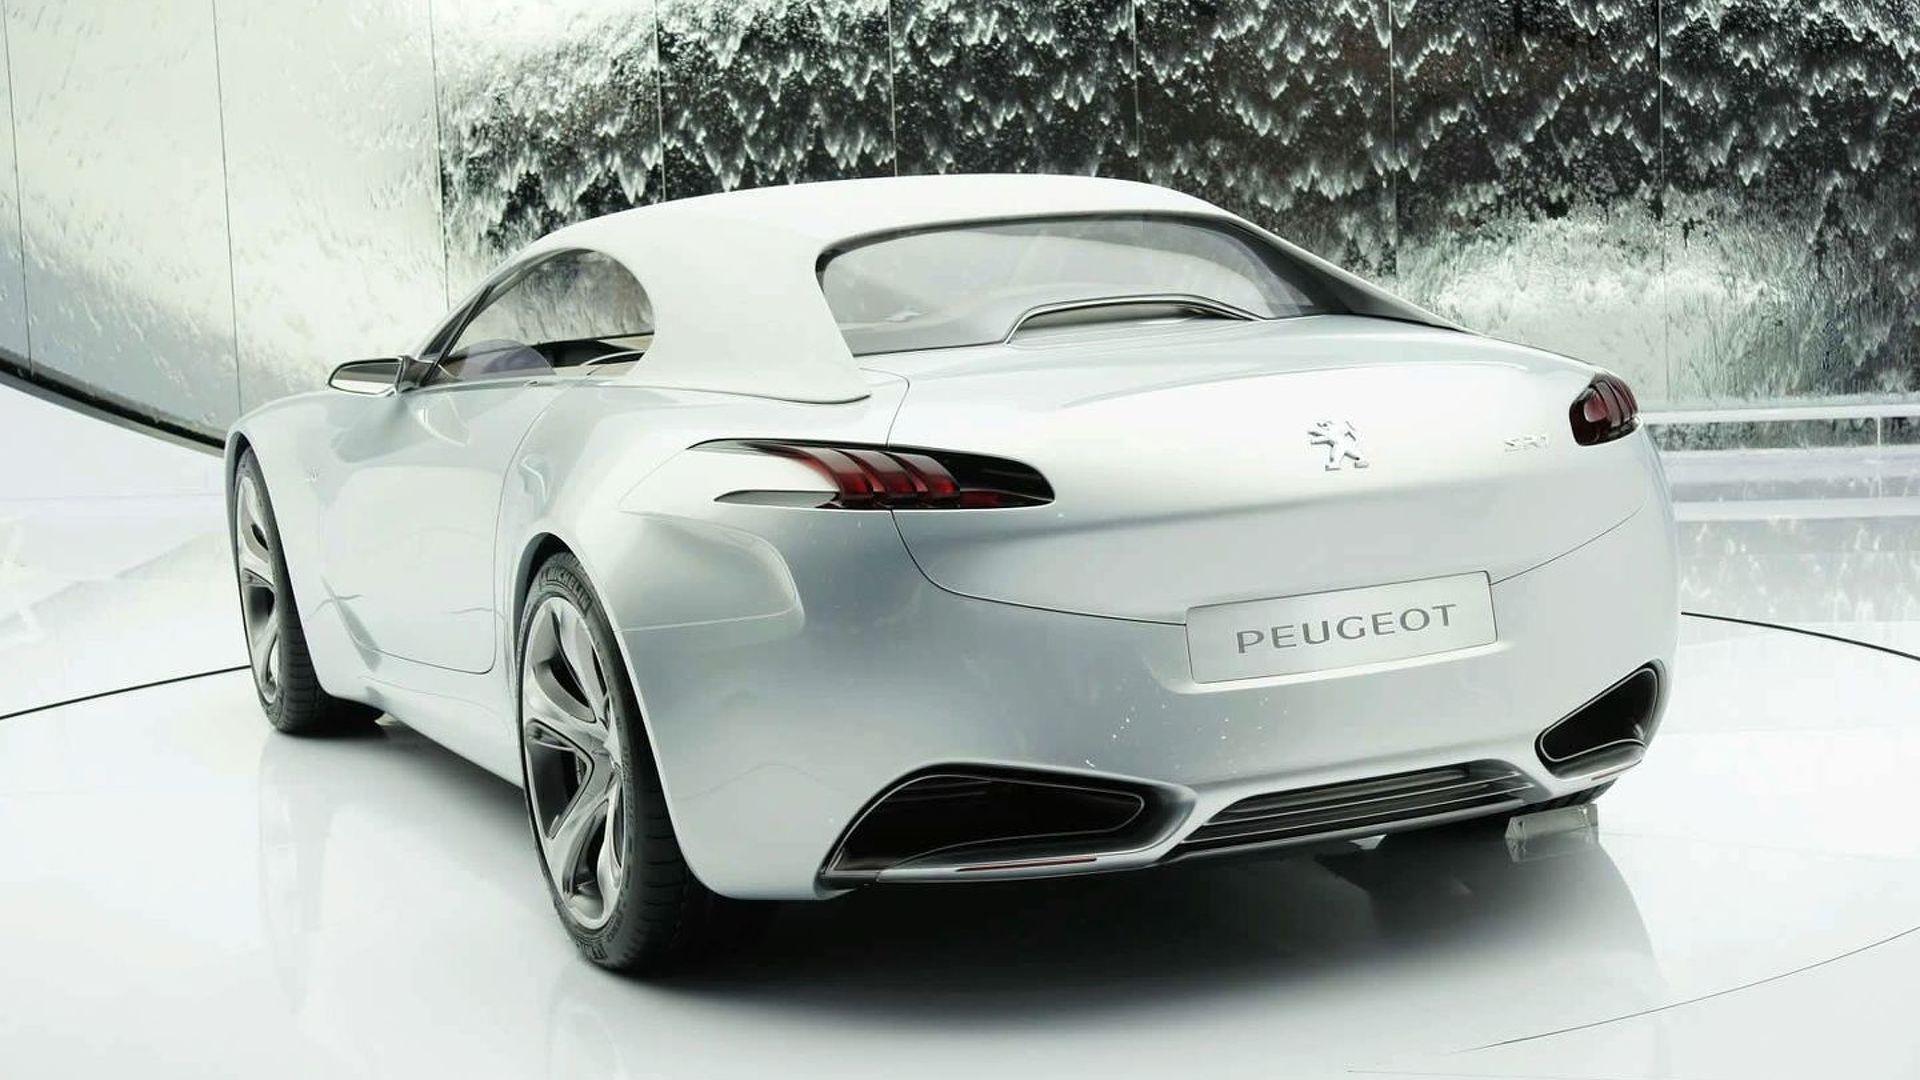 Peugeot Sr1 Follow Up Concept To Debut In Paris Rumors